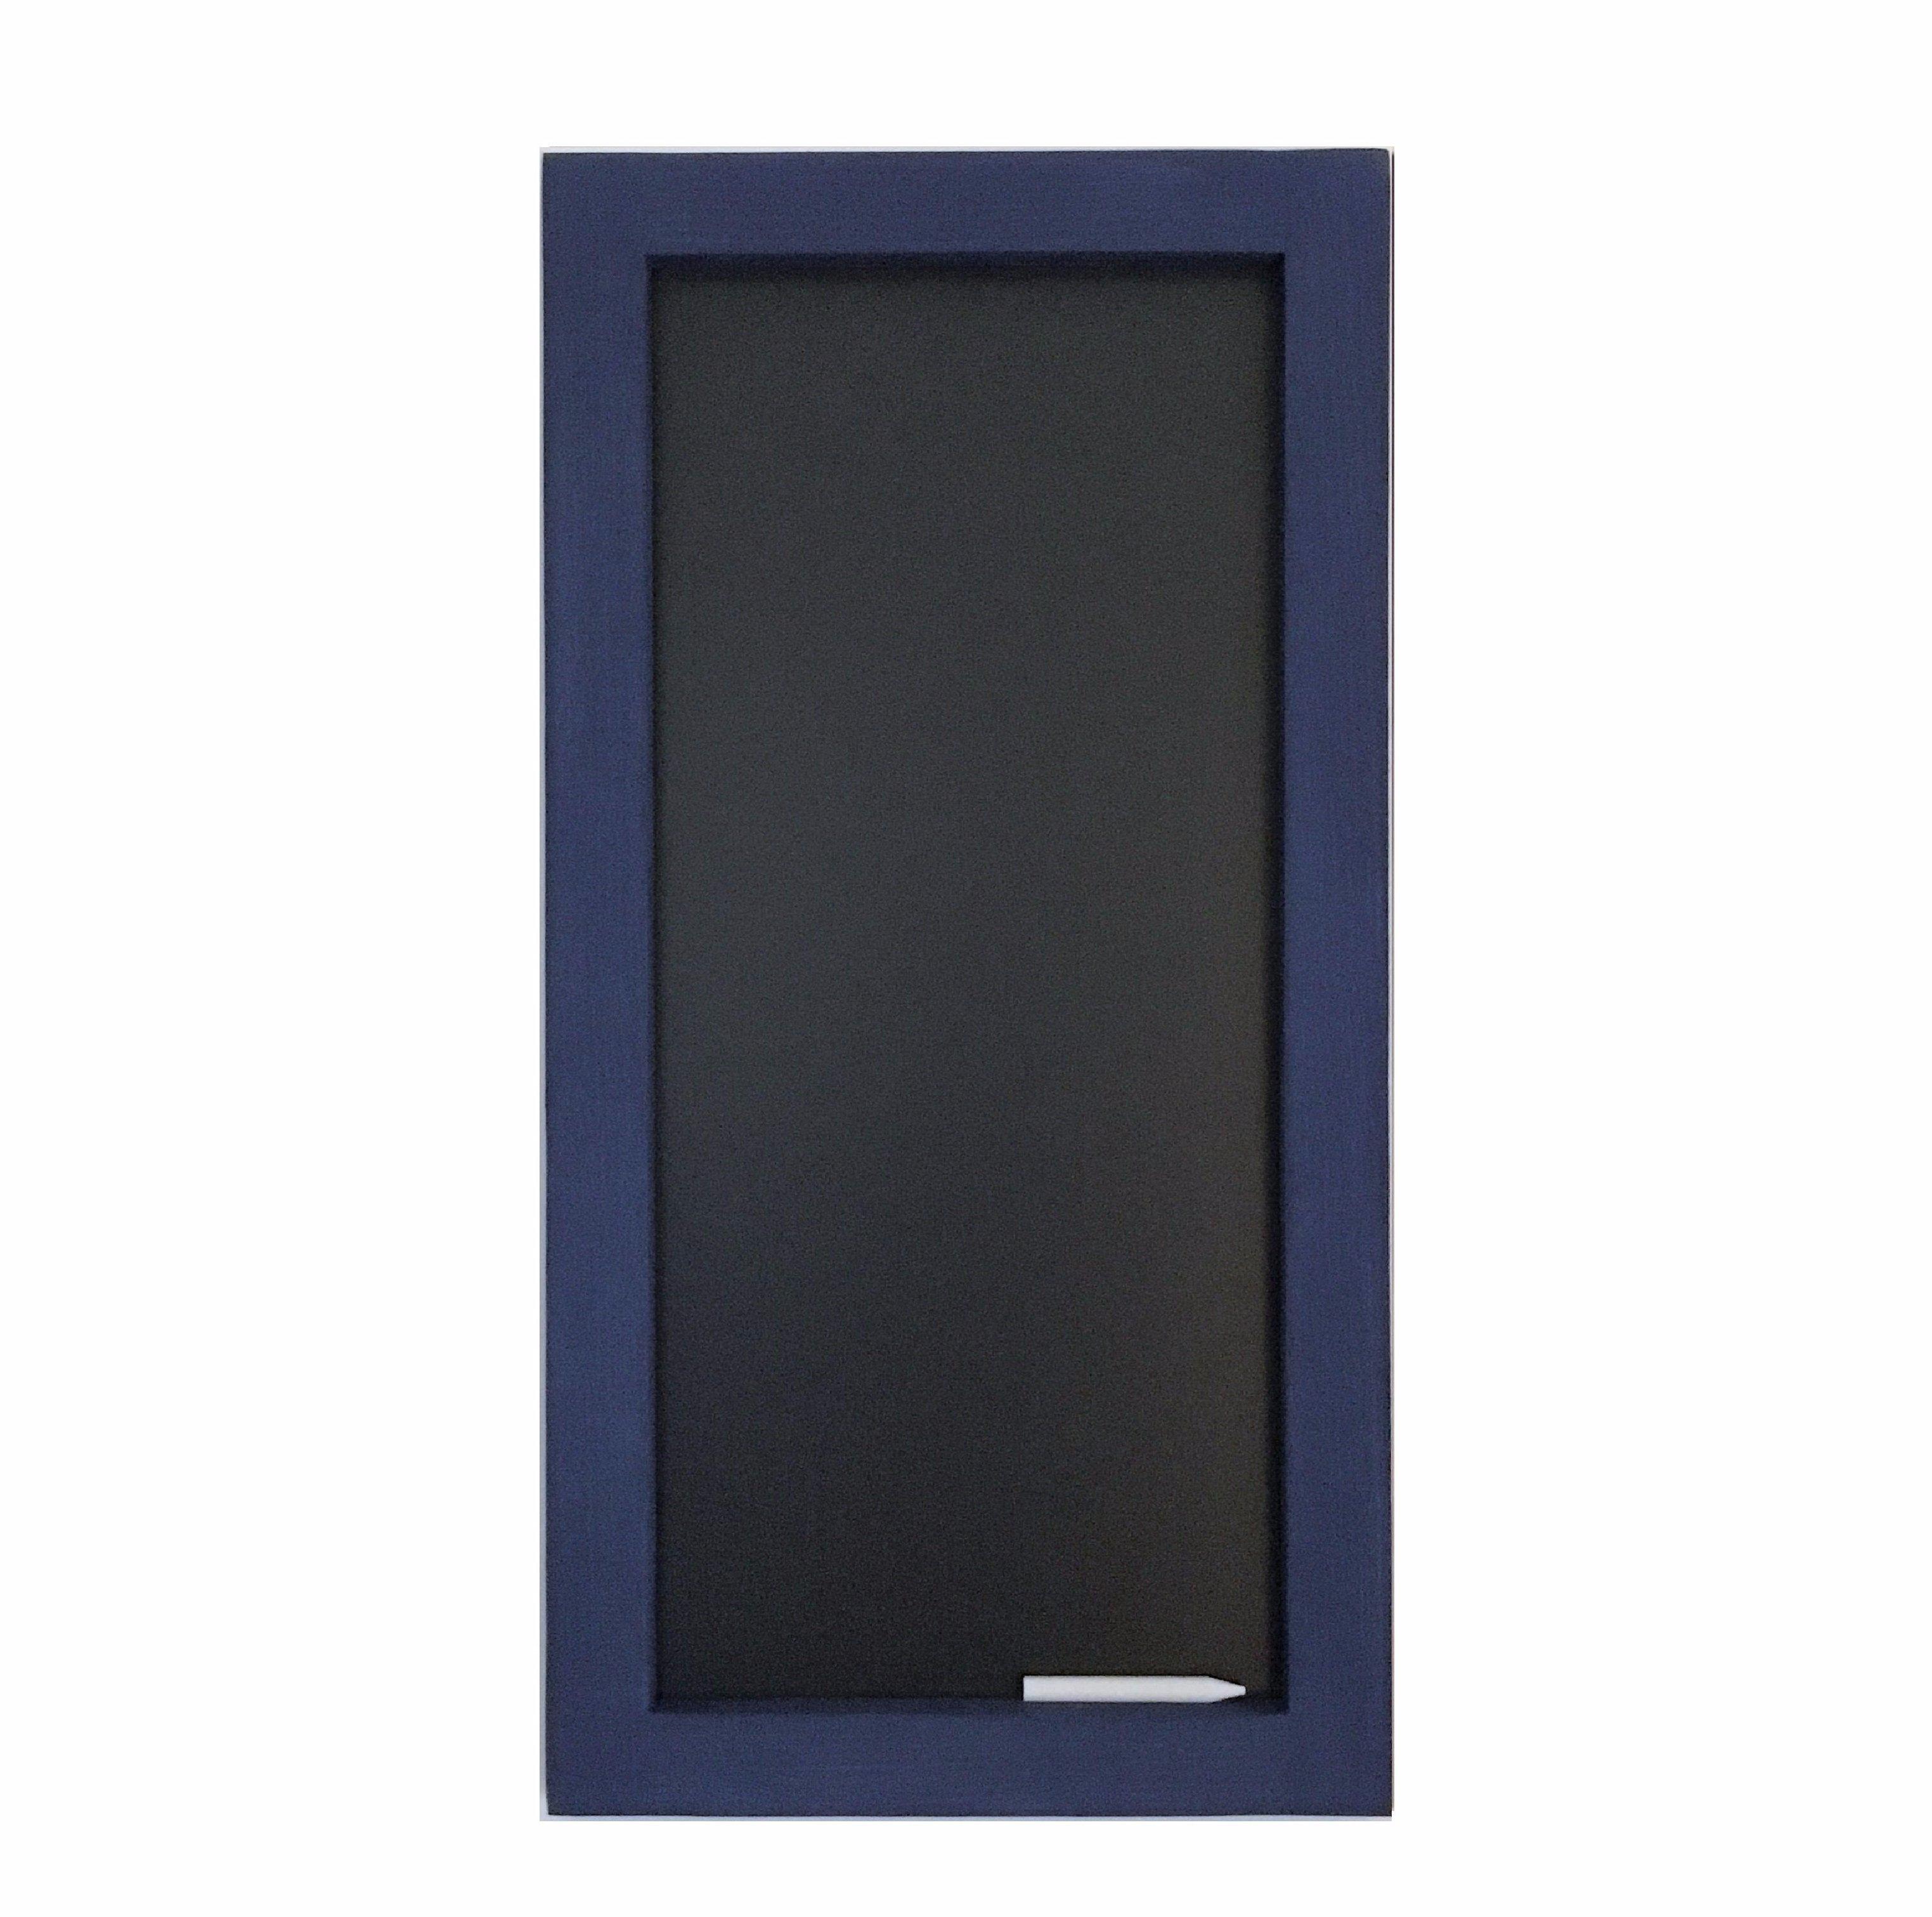 3047x3023 Rectangular Chalkboard With Atlantic Pine Frame 12 X 24 Wall